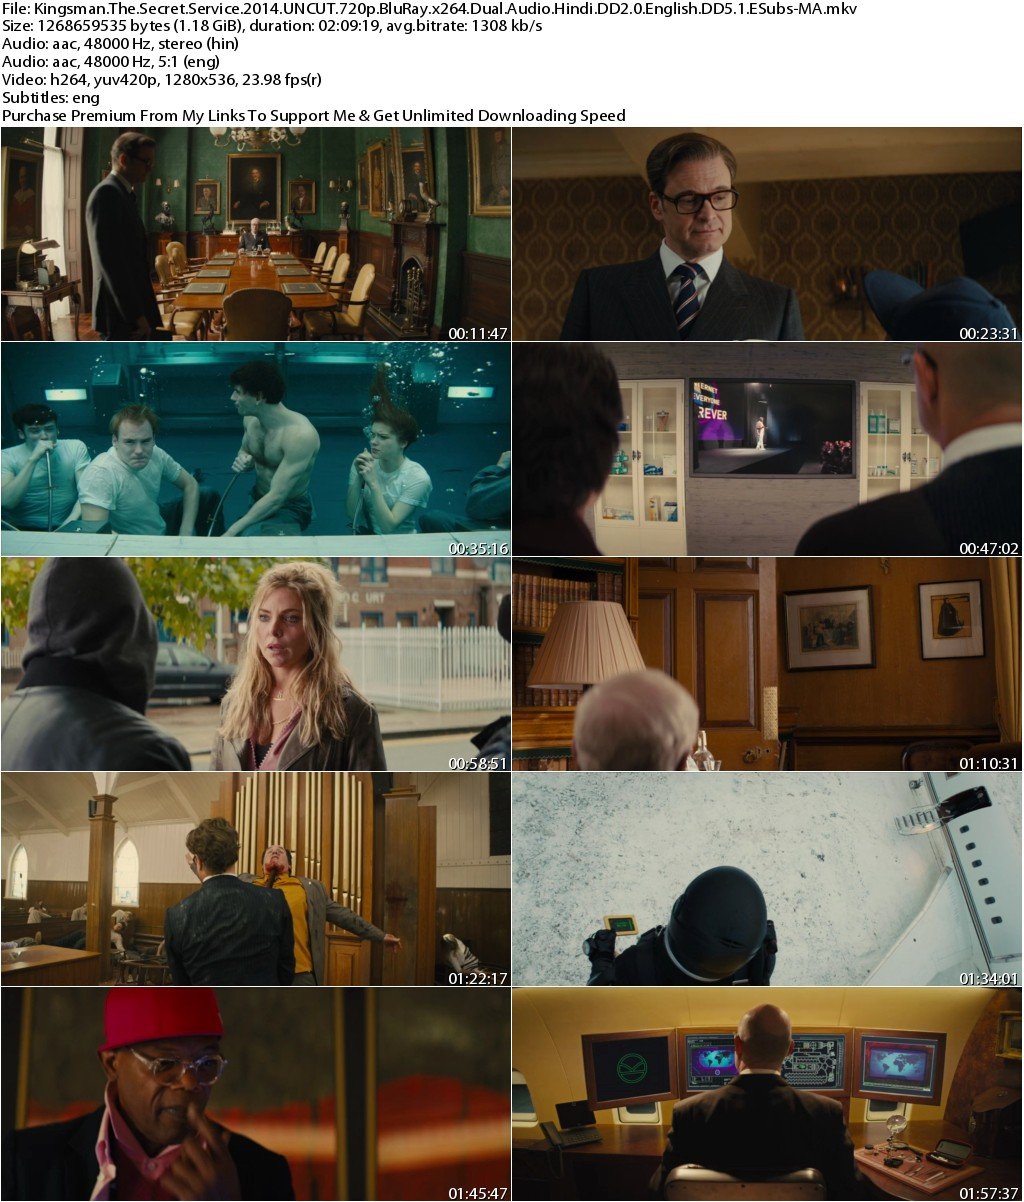 Kingsman The Secret Service (2014) UNCUT 720p BluRay x264 Dual Audio Hindi DD2.0 English DD5.1 ESubs-MA